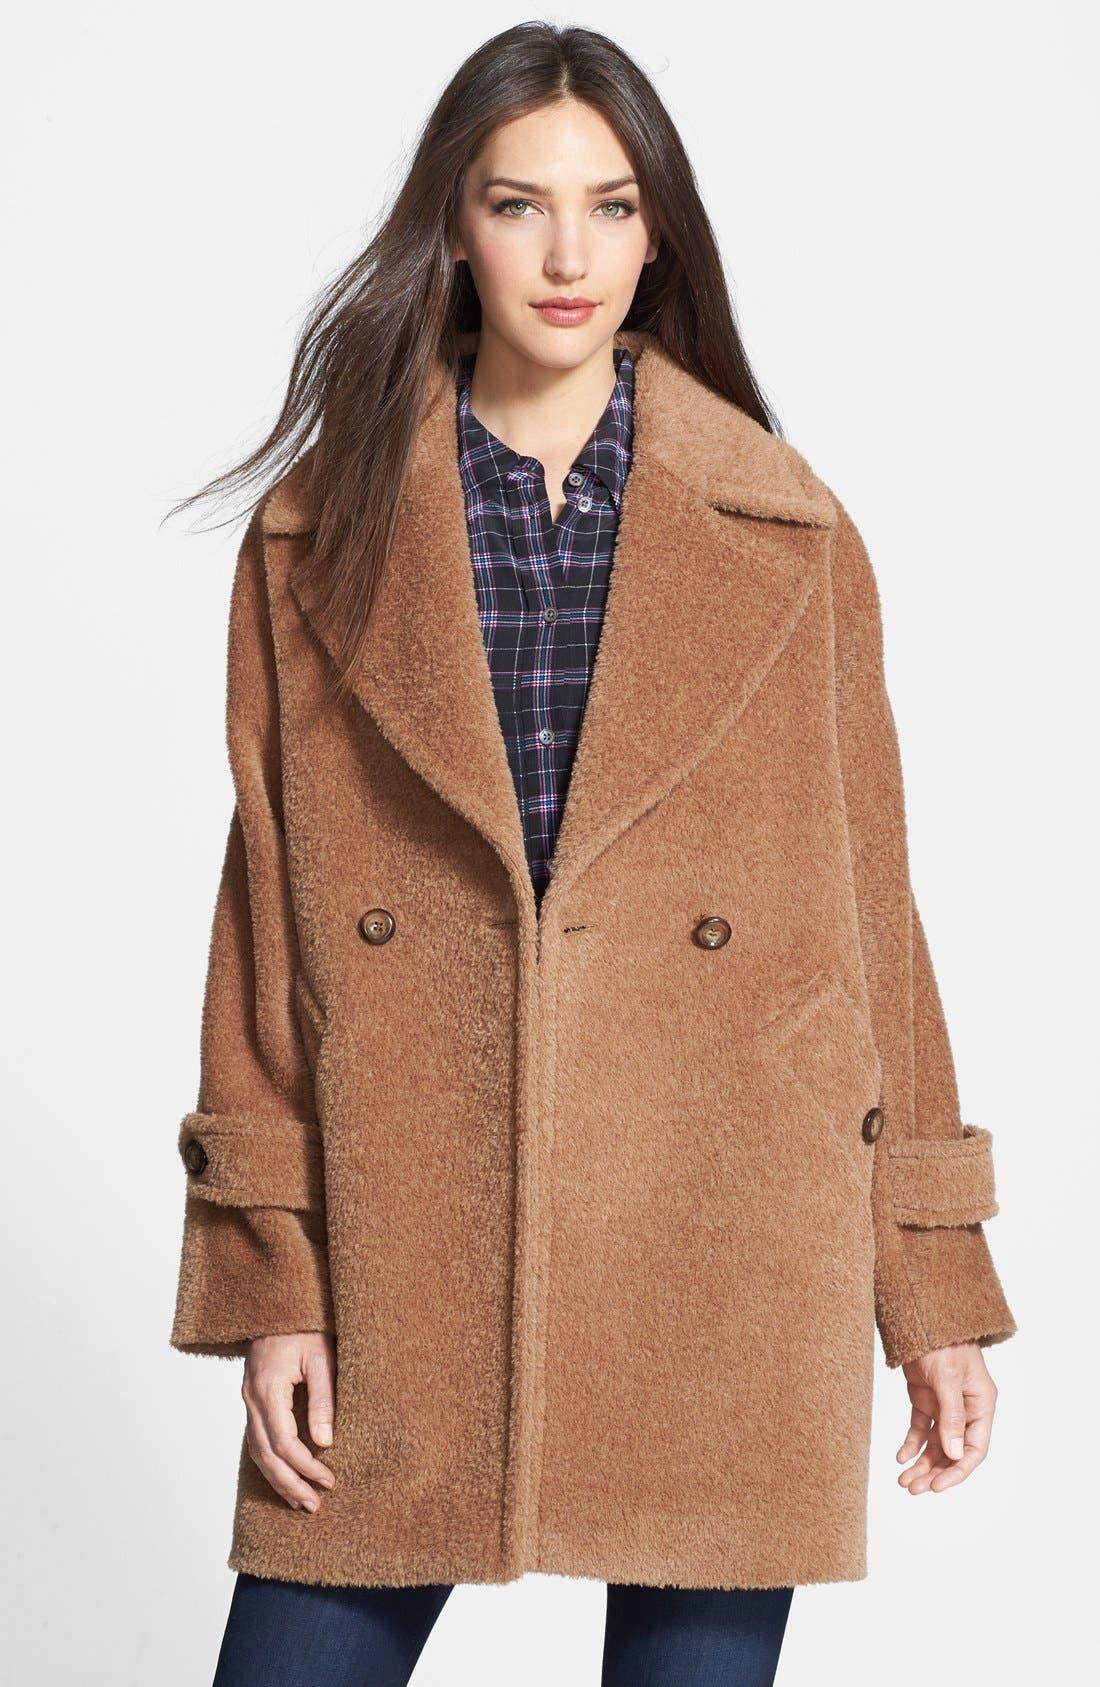 Alternate Image 1 Selected - Trina Turk 'Nancy' Double Breasted Wool & Alpaca Blend Coat